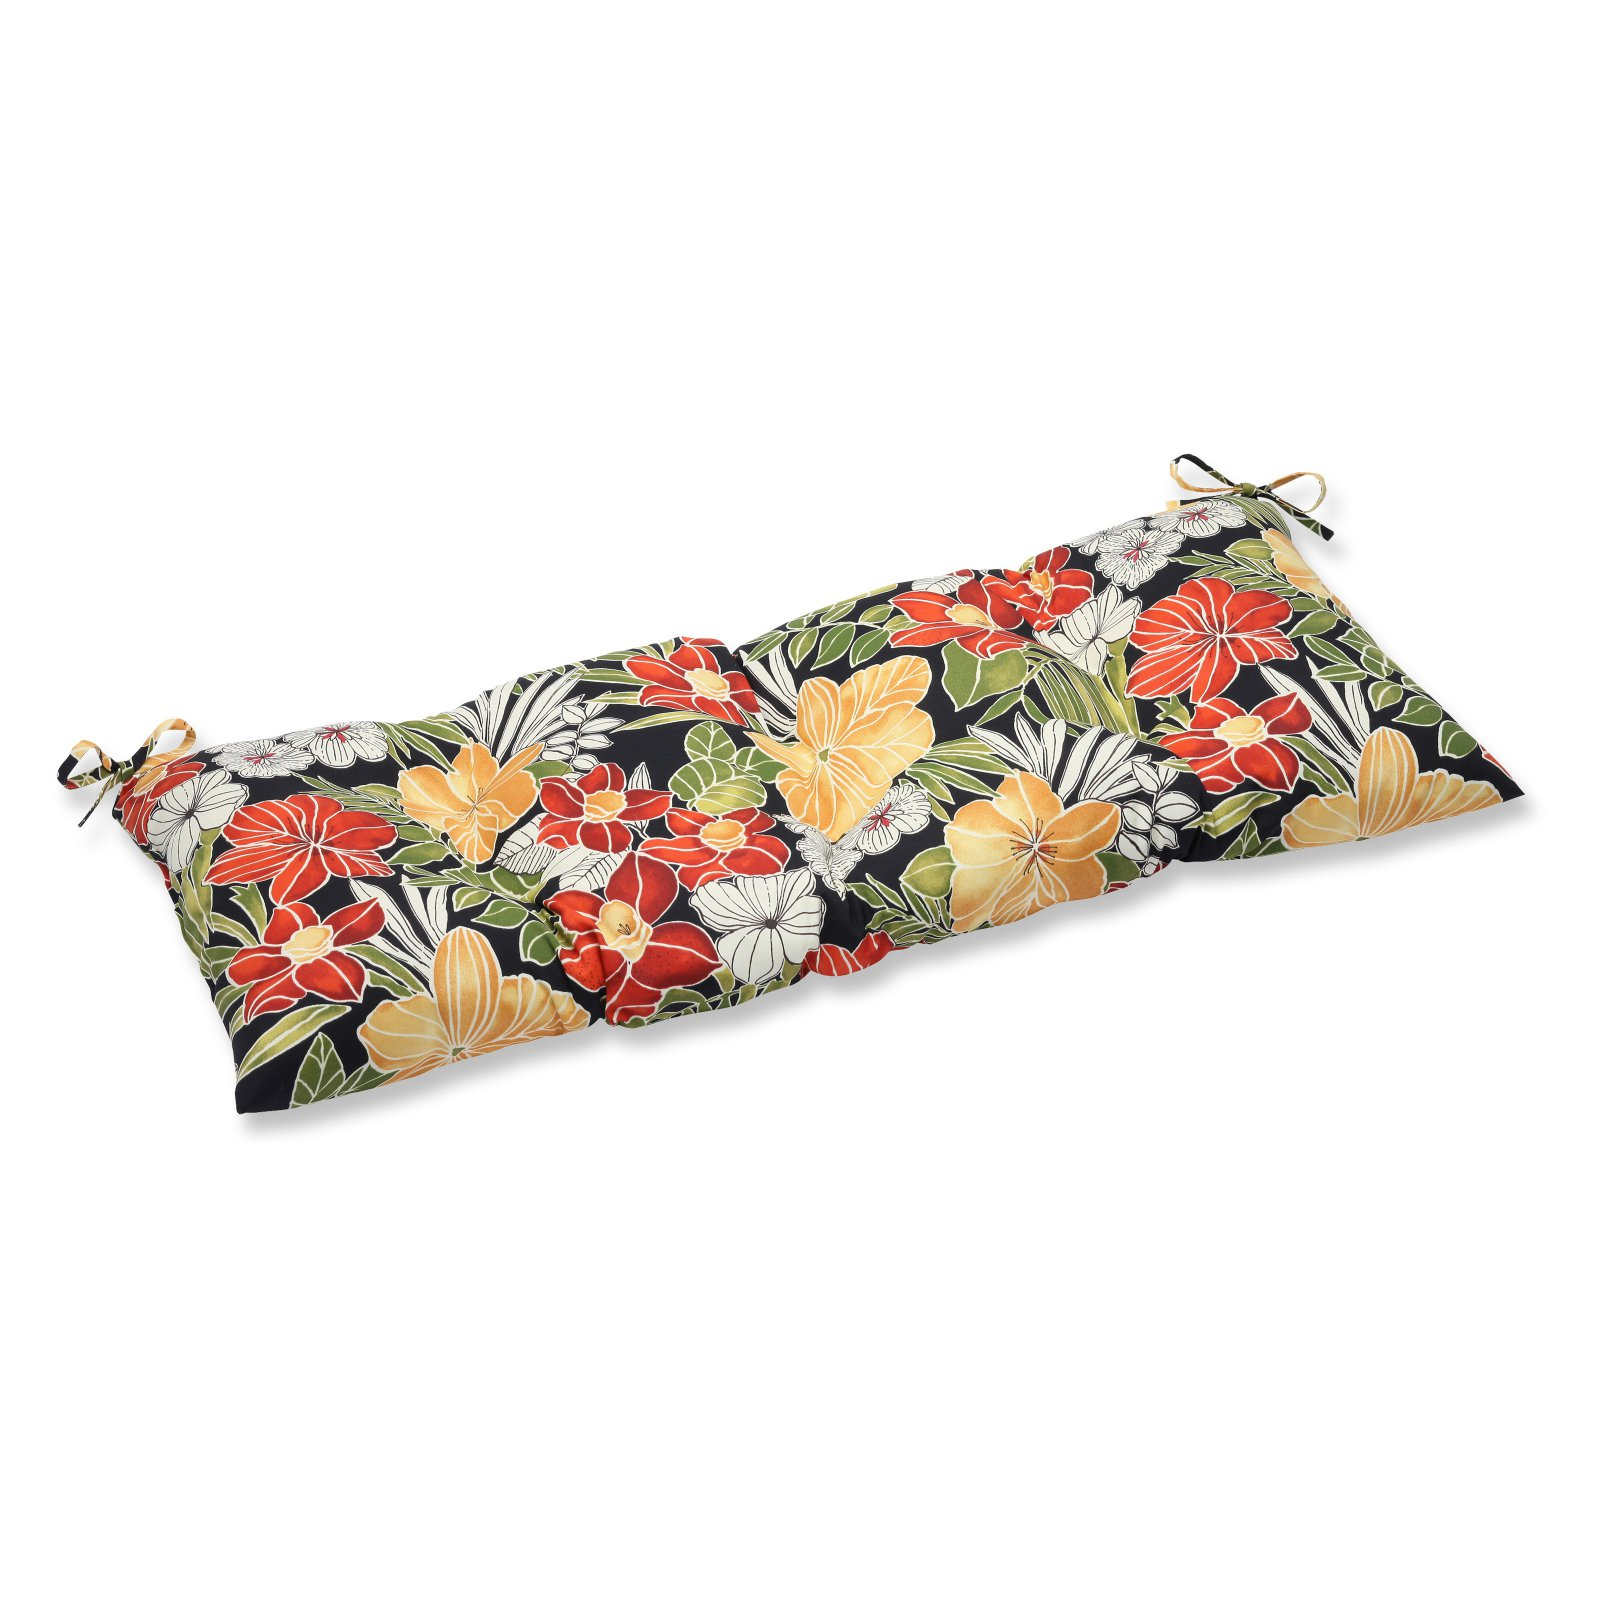 Pillow Perfect Outdoor/ Indoor Clemens Noir Wrought Iron Loveseat Cushion